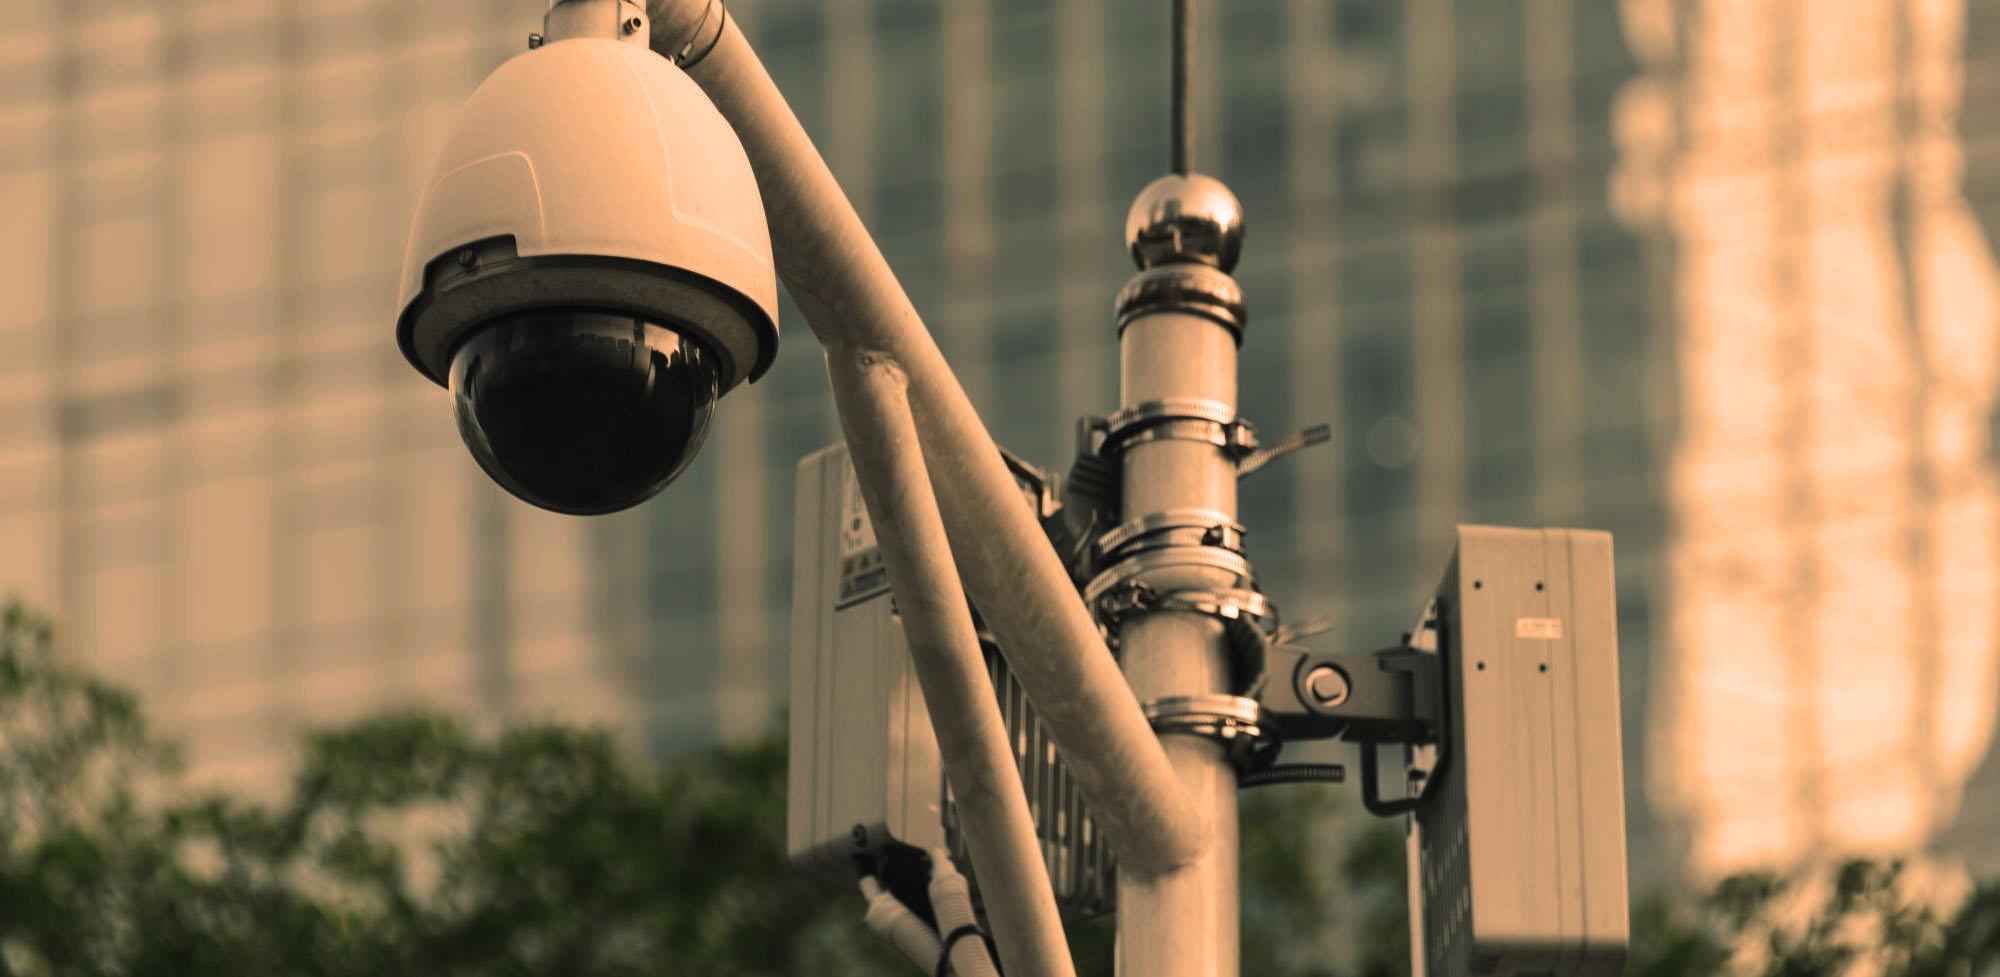 TVCC videocamera di sicurezza in citta